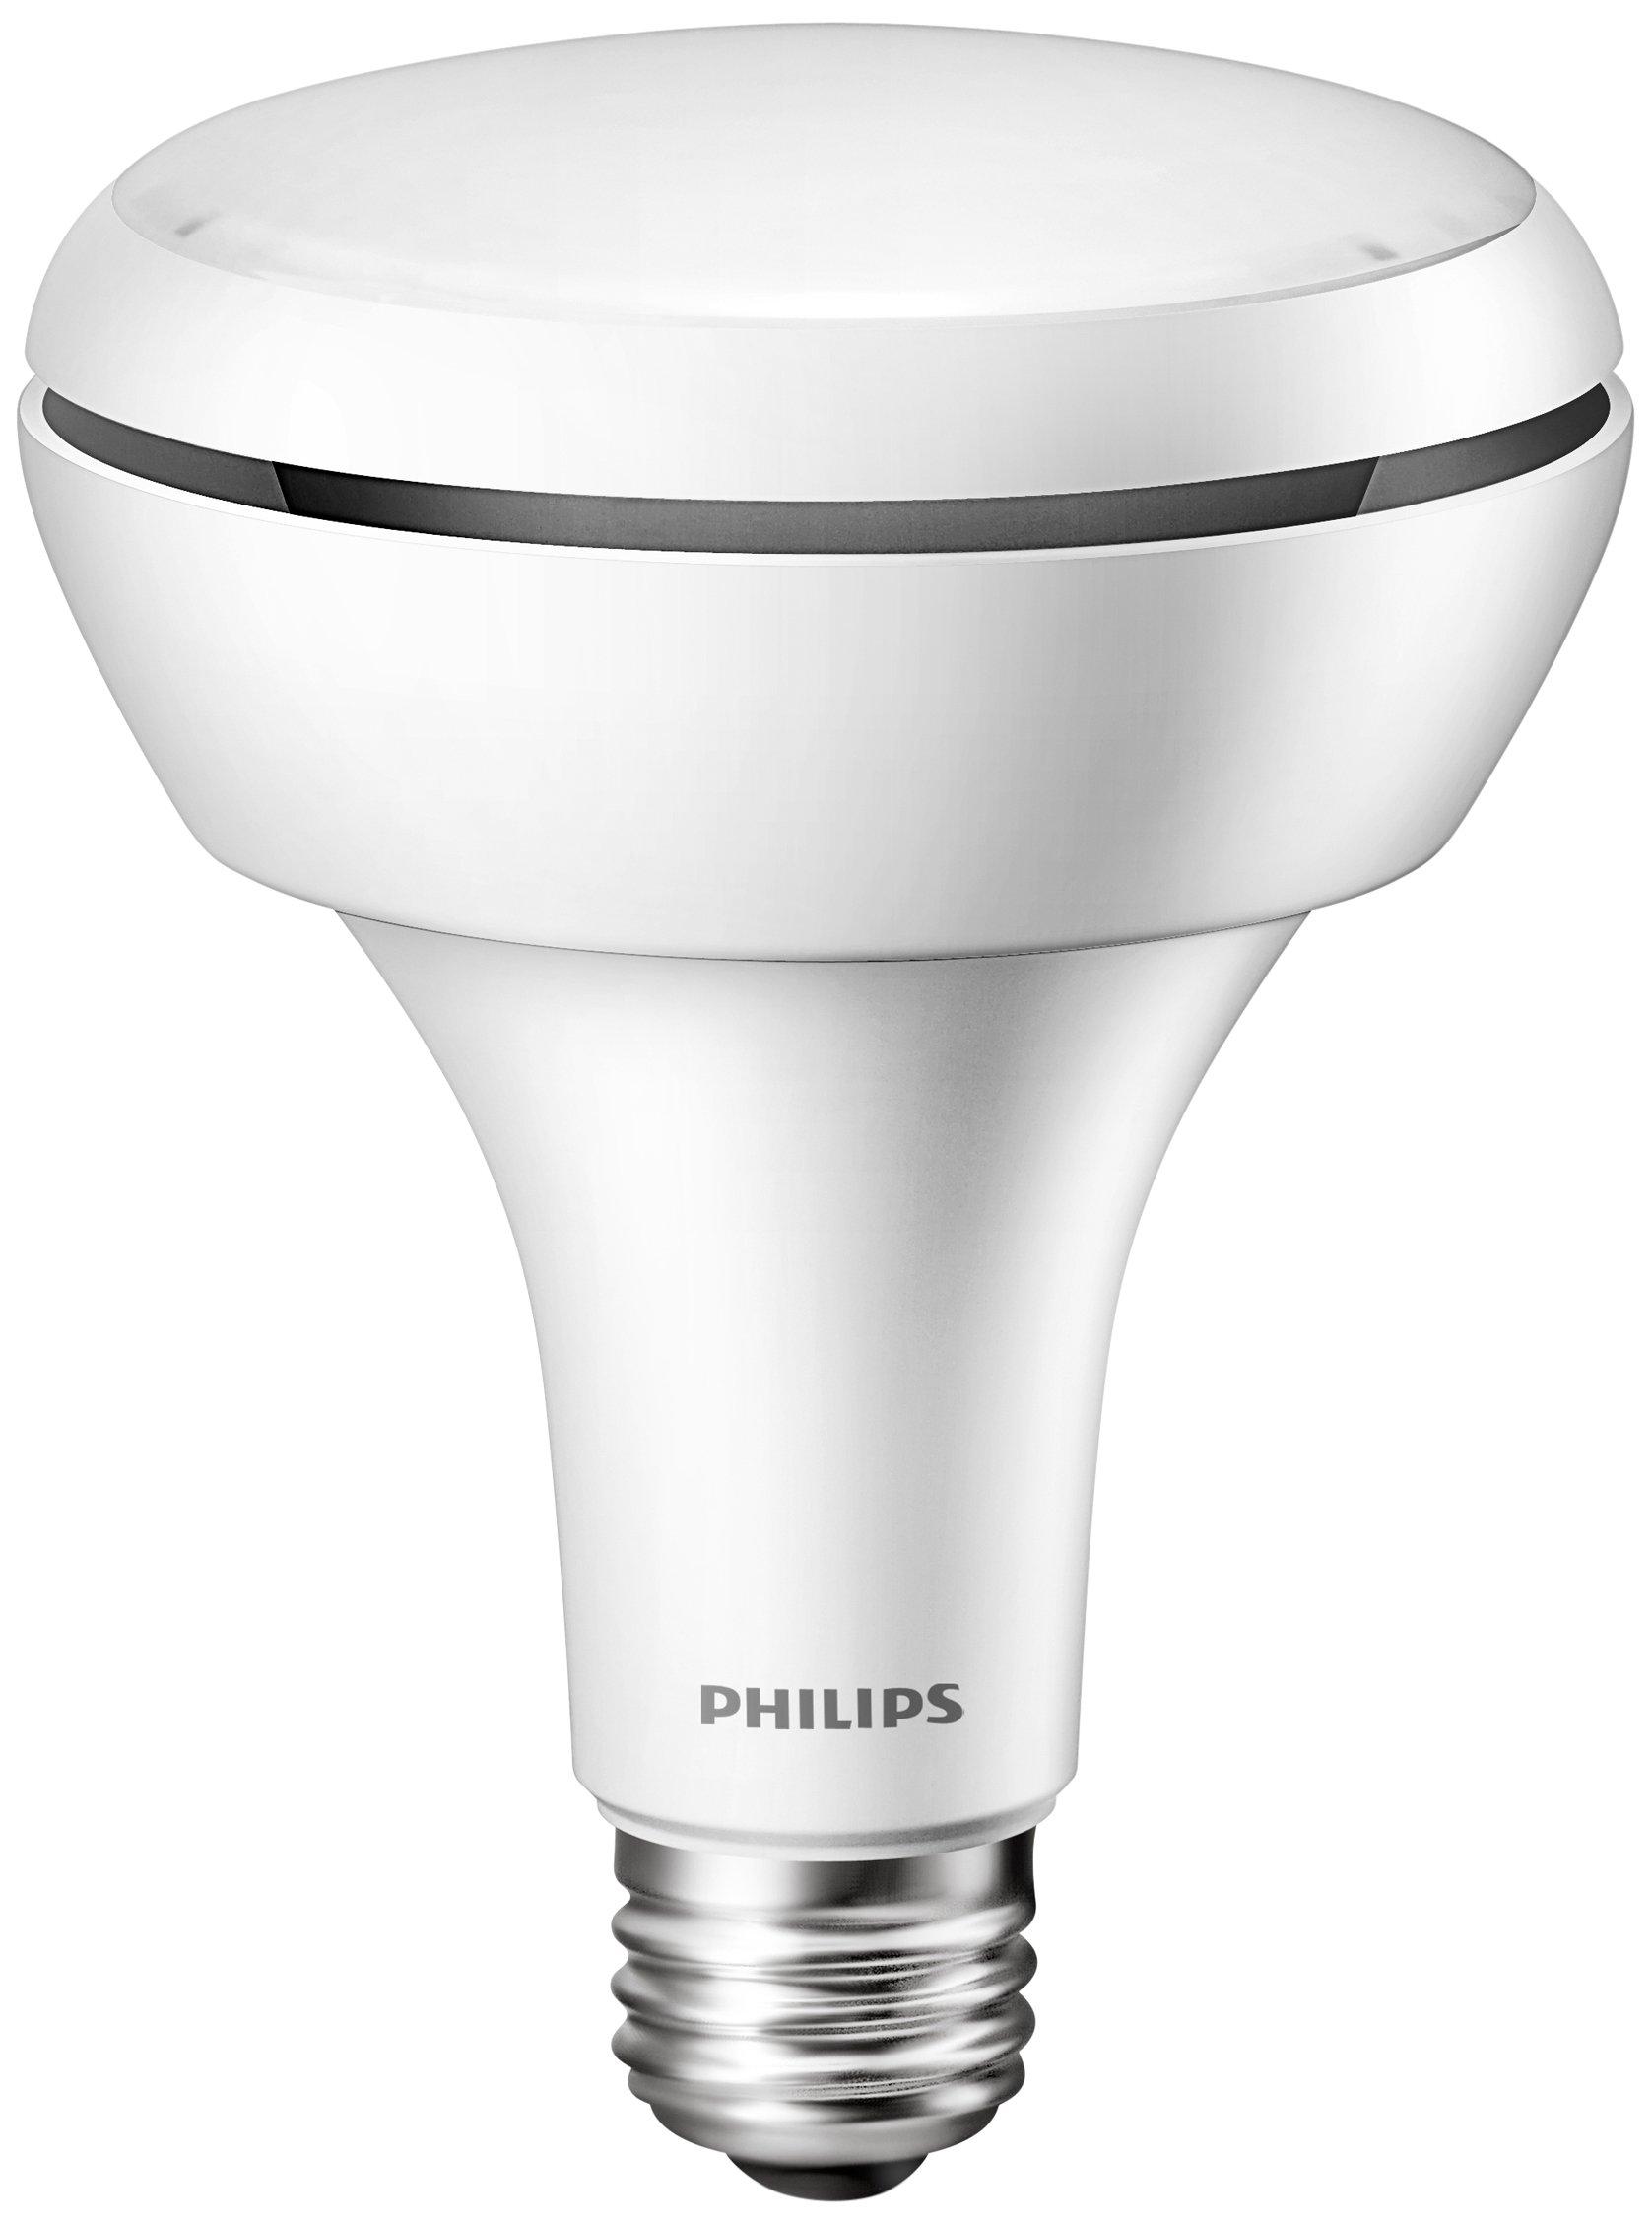 philips 65w equivalent led br30 soft flood light bulb with. Black Bedroom Furniture Sets. Home Design Ideas